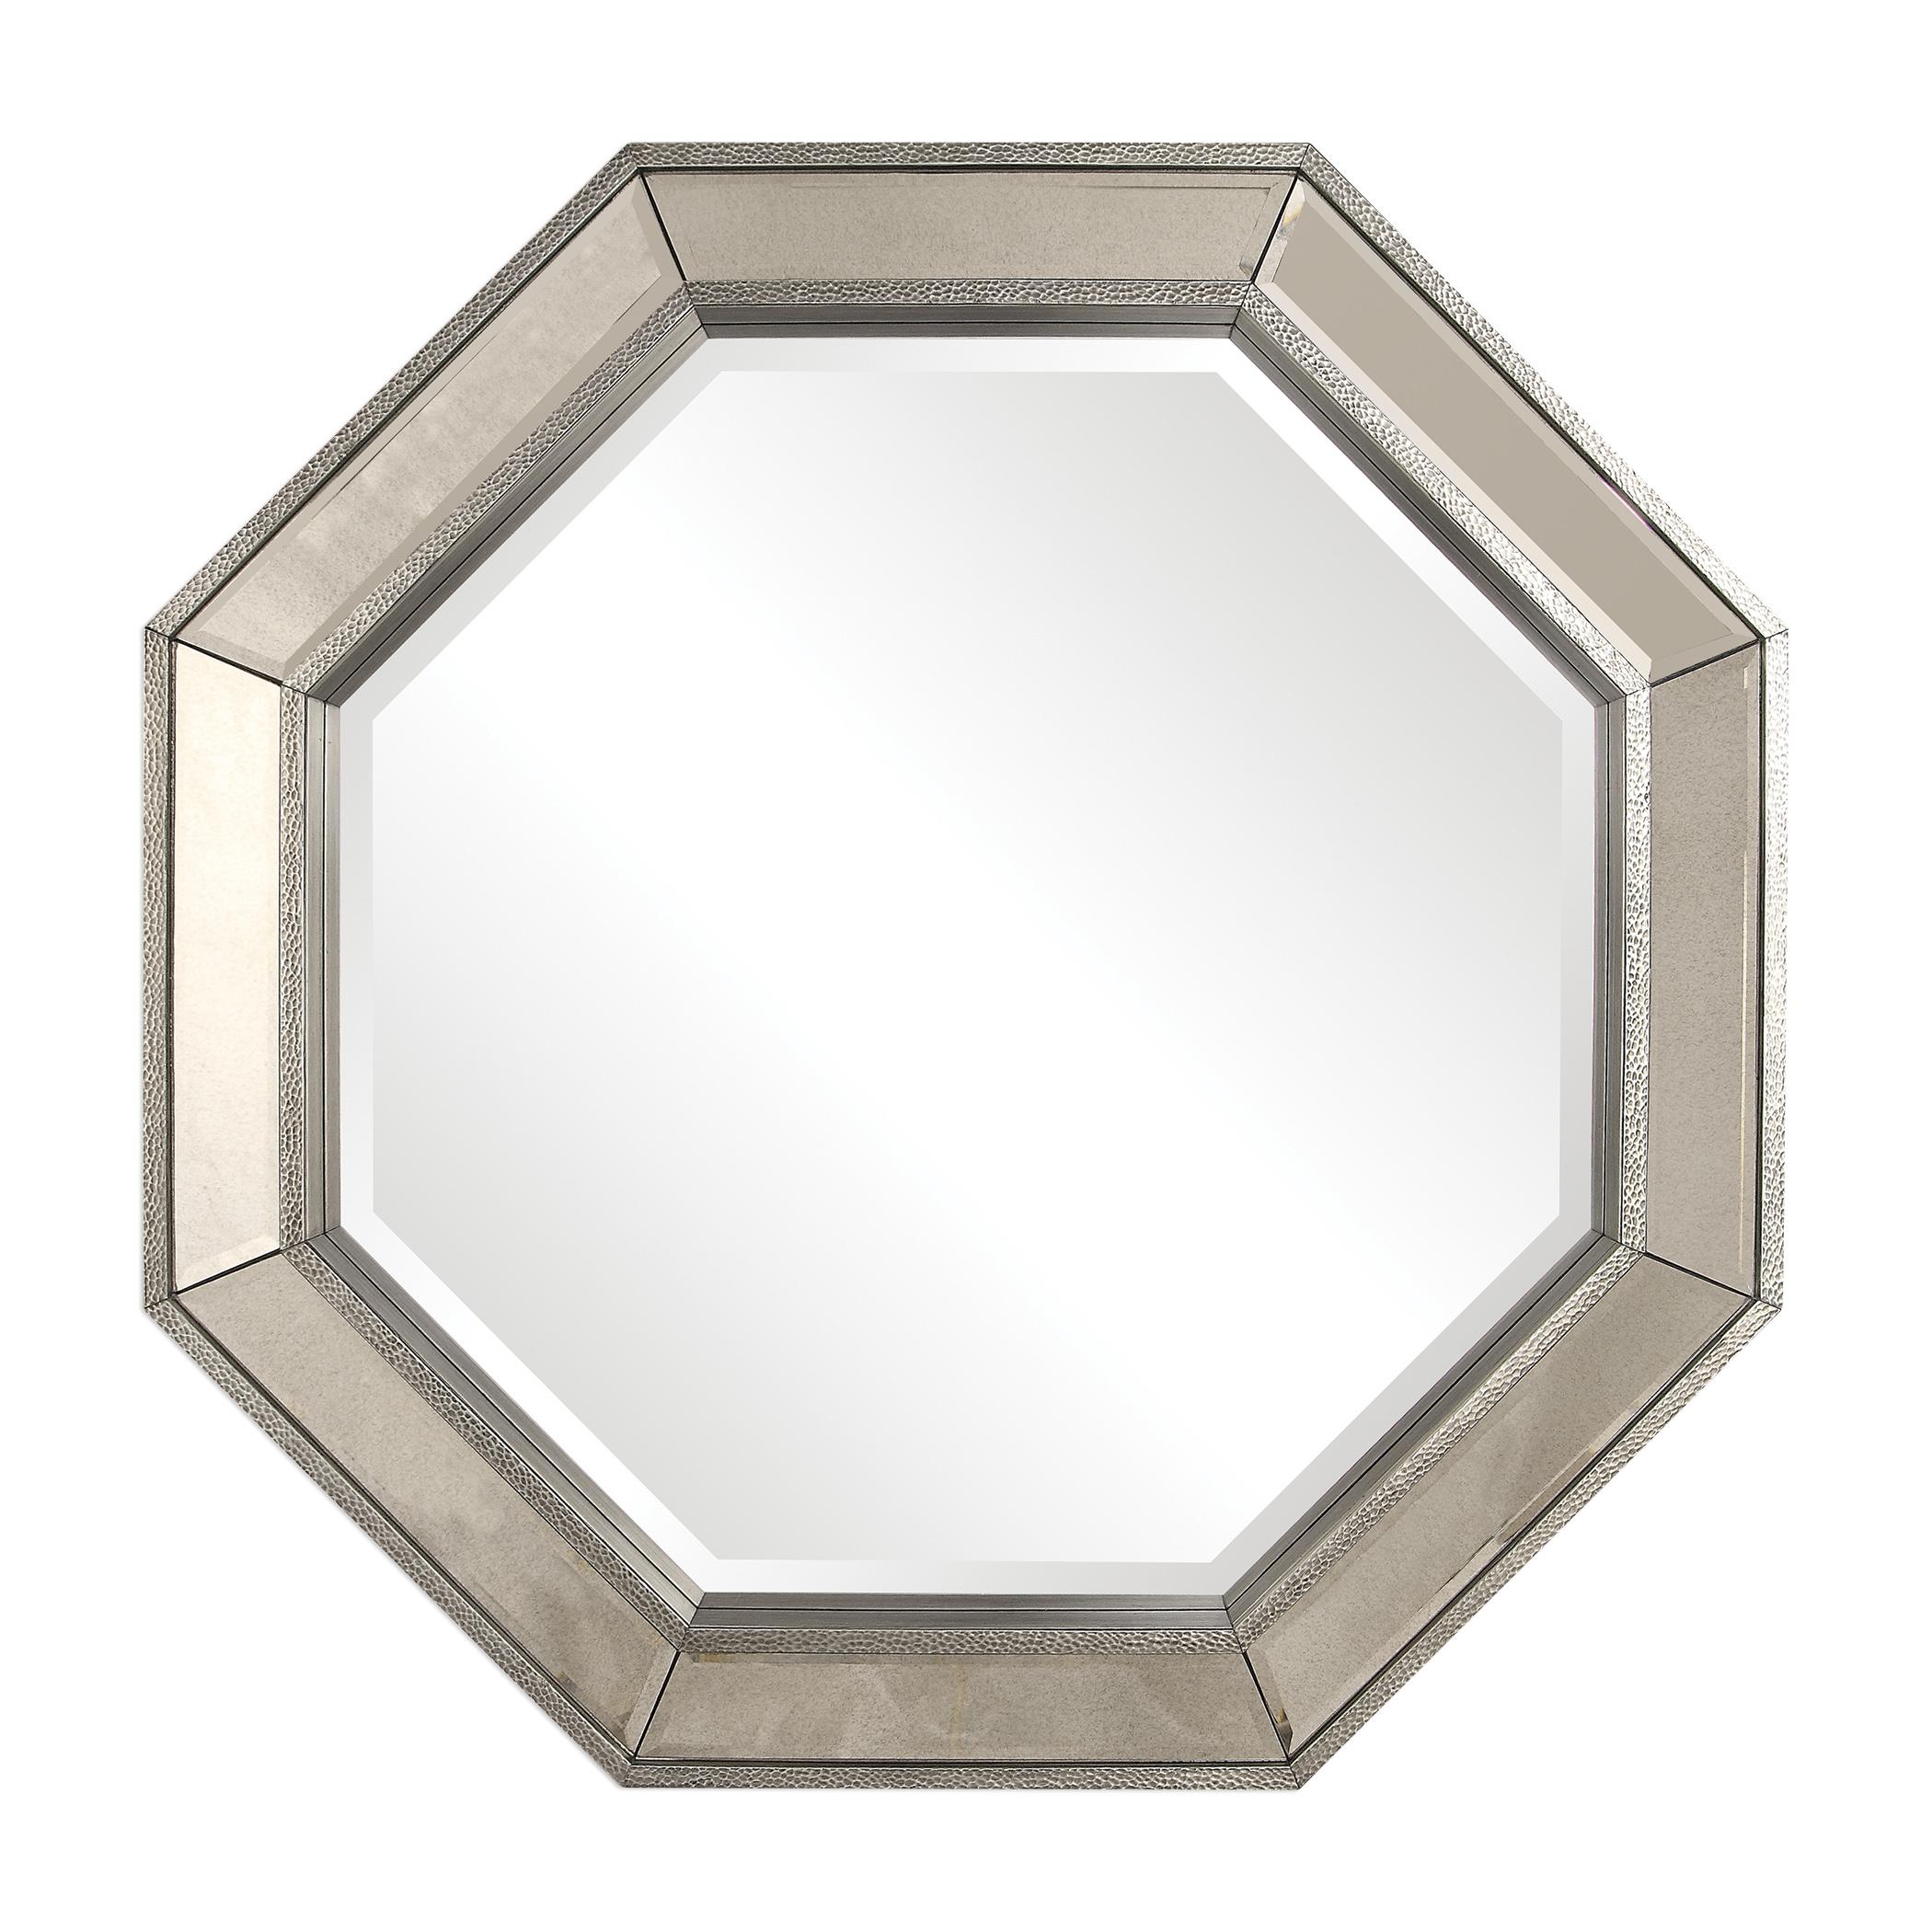 Glam-Octagon-Silver-Mirror-Framed-Wall-Mirror-38-034-Round-Venetian-Vanity-Classic